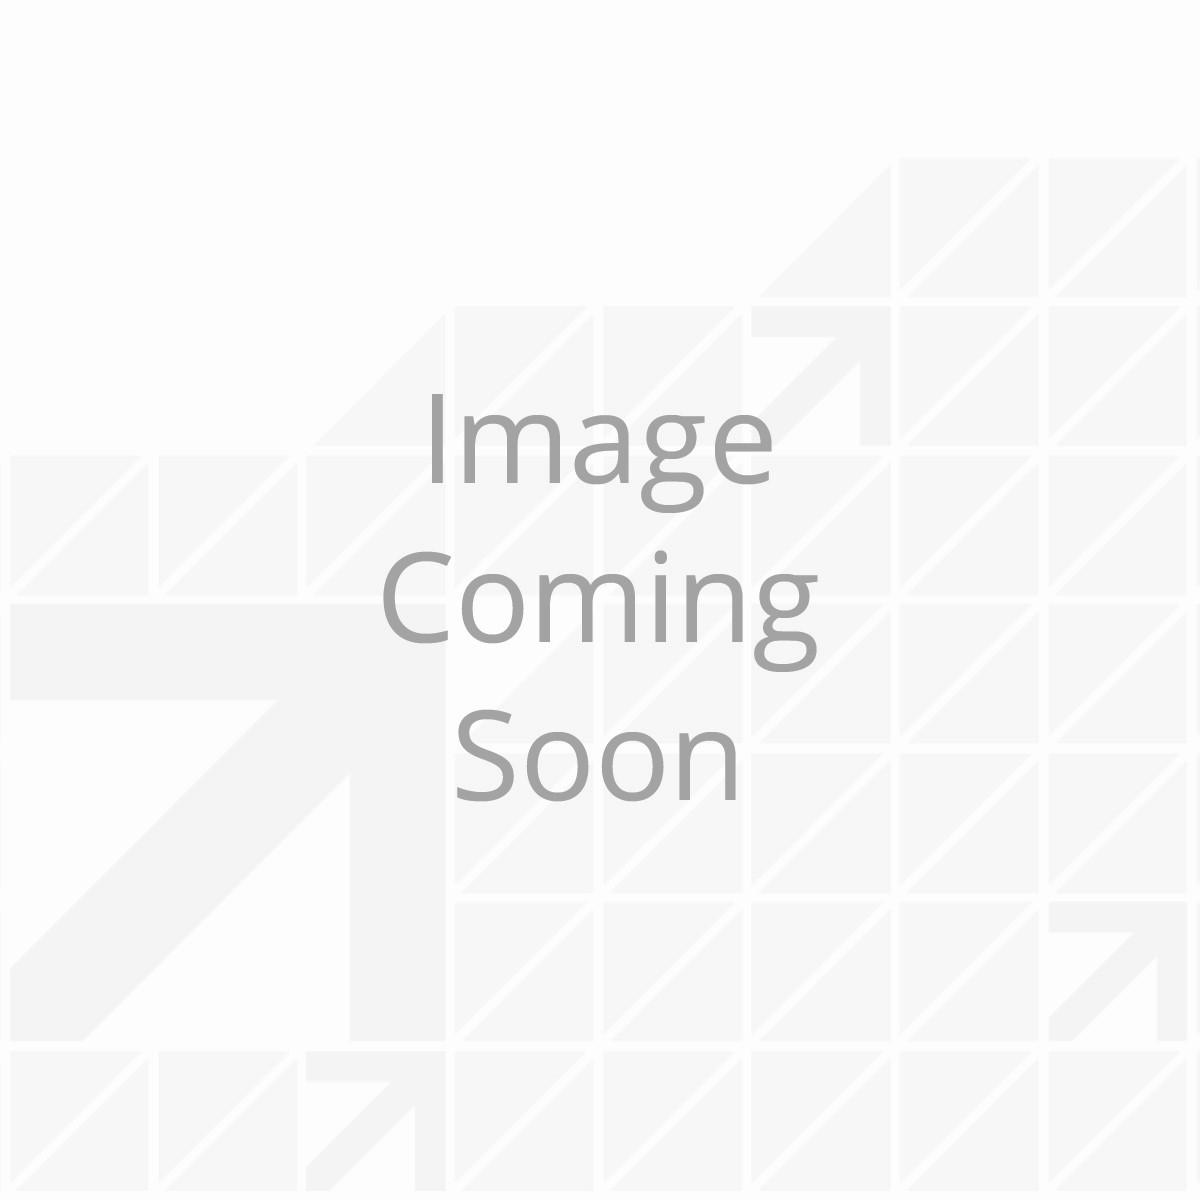 "ALPHABOND TPO Tape 2"" x 50' (Case of 12) - Various Colors"